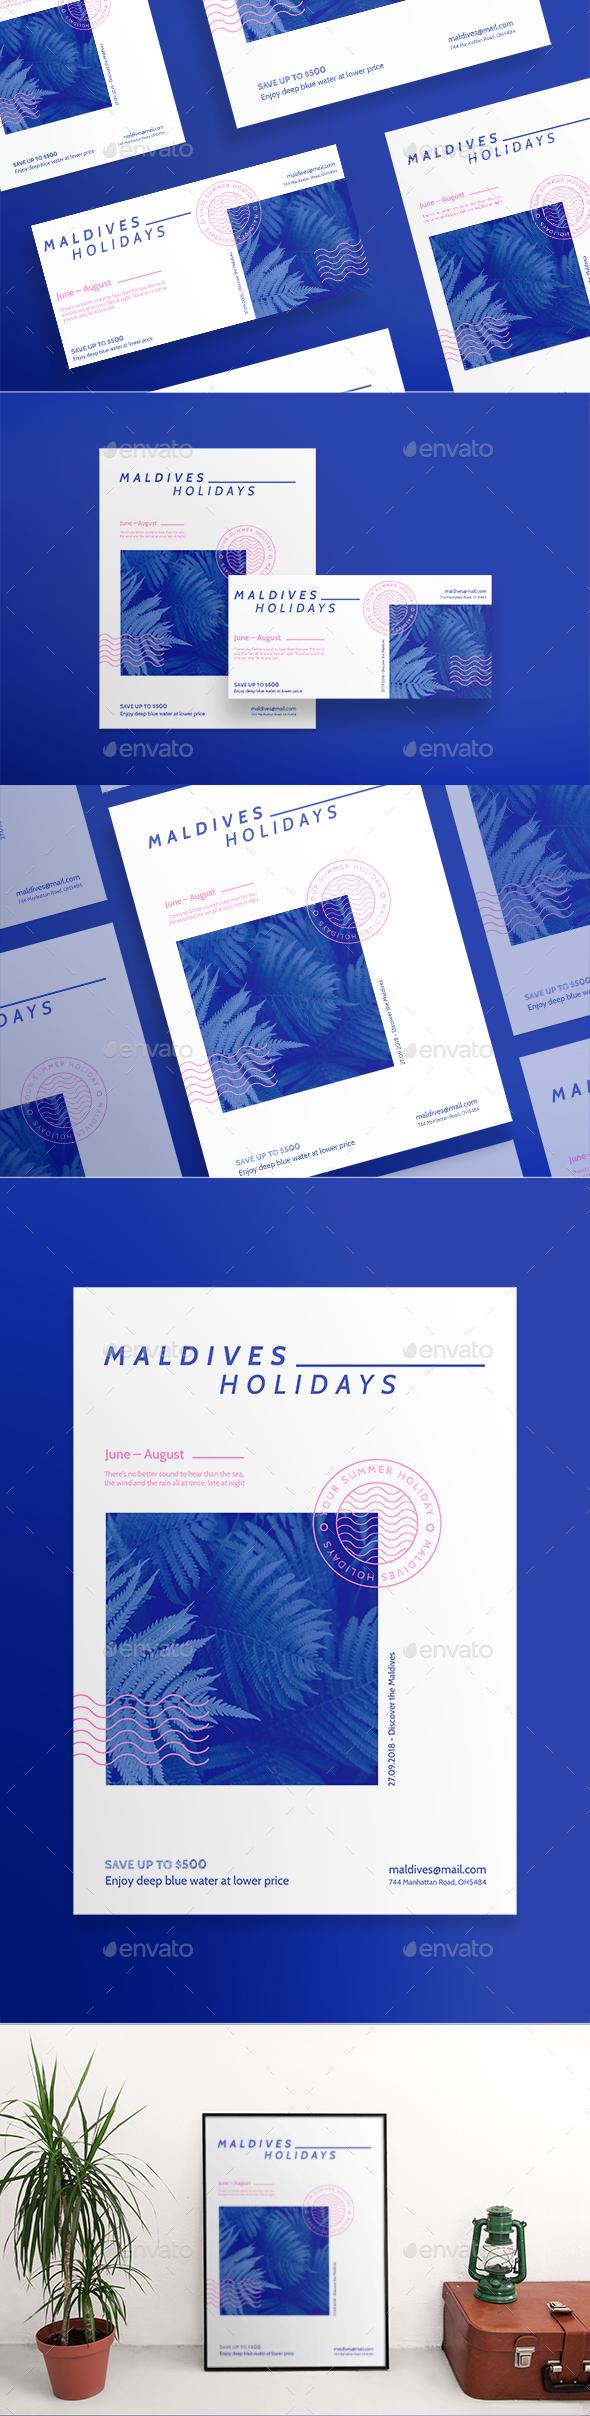 Maldives Holidays Flyers - Holidays Events